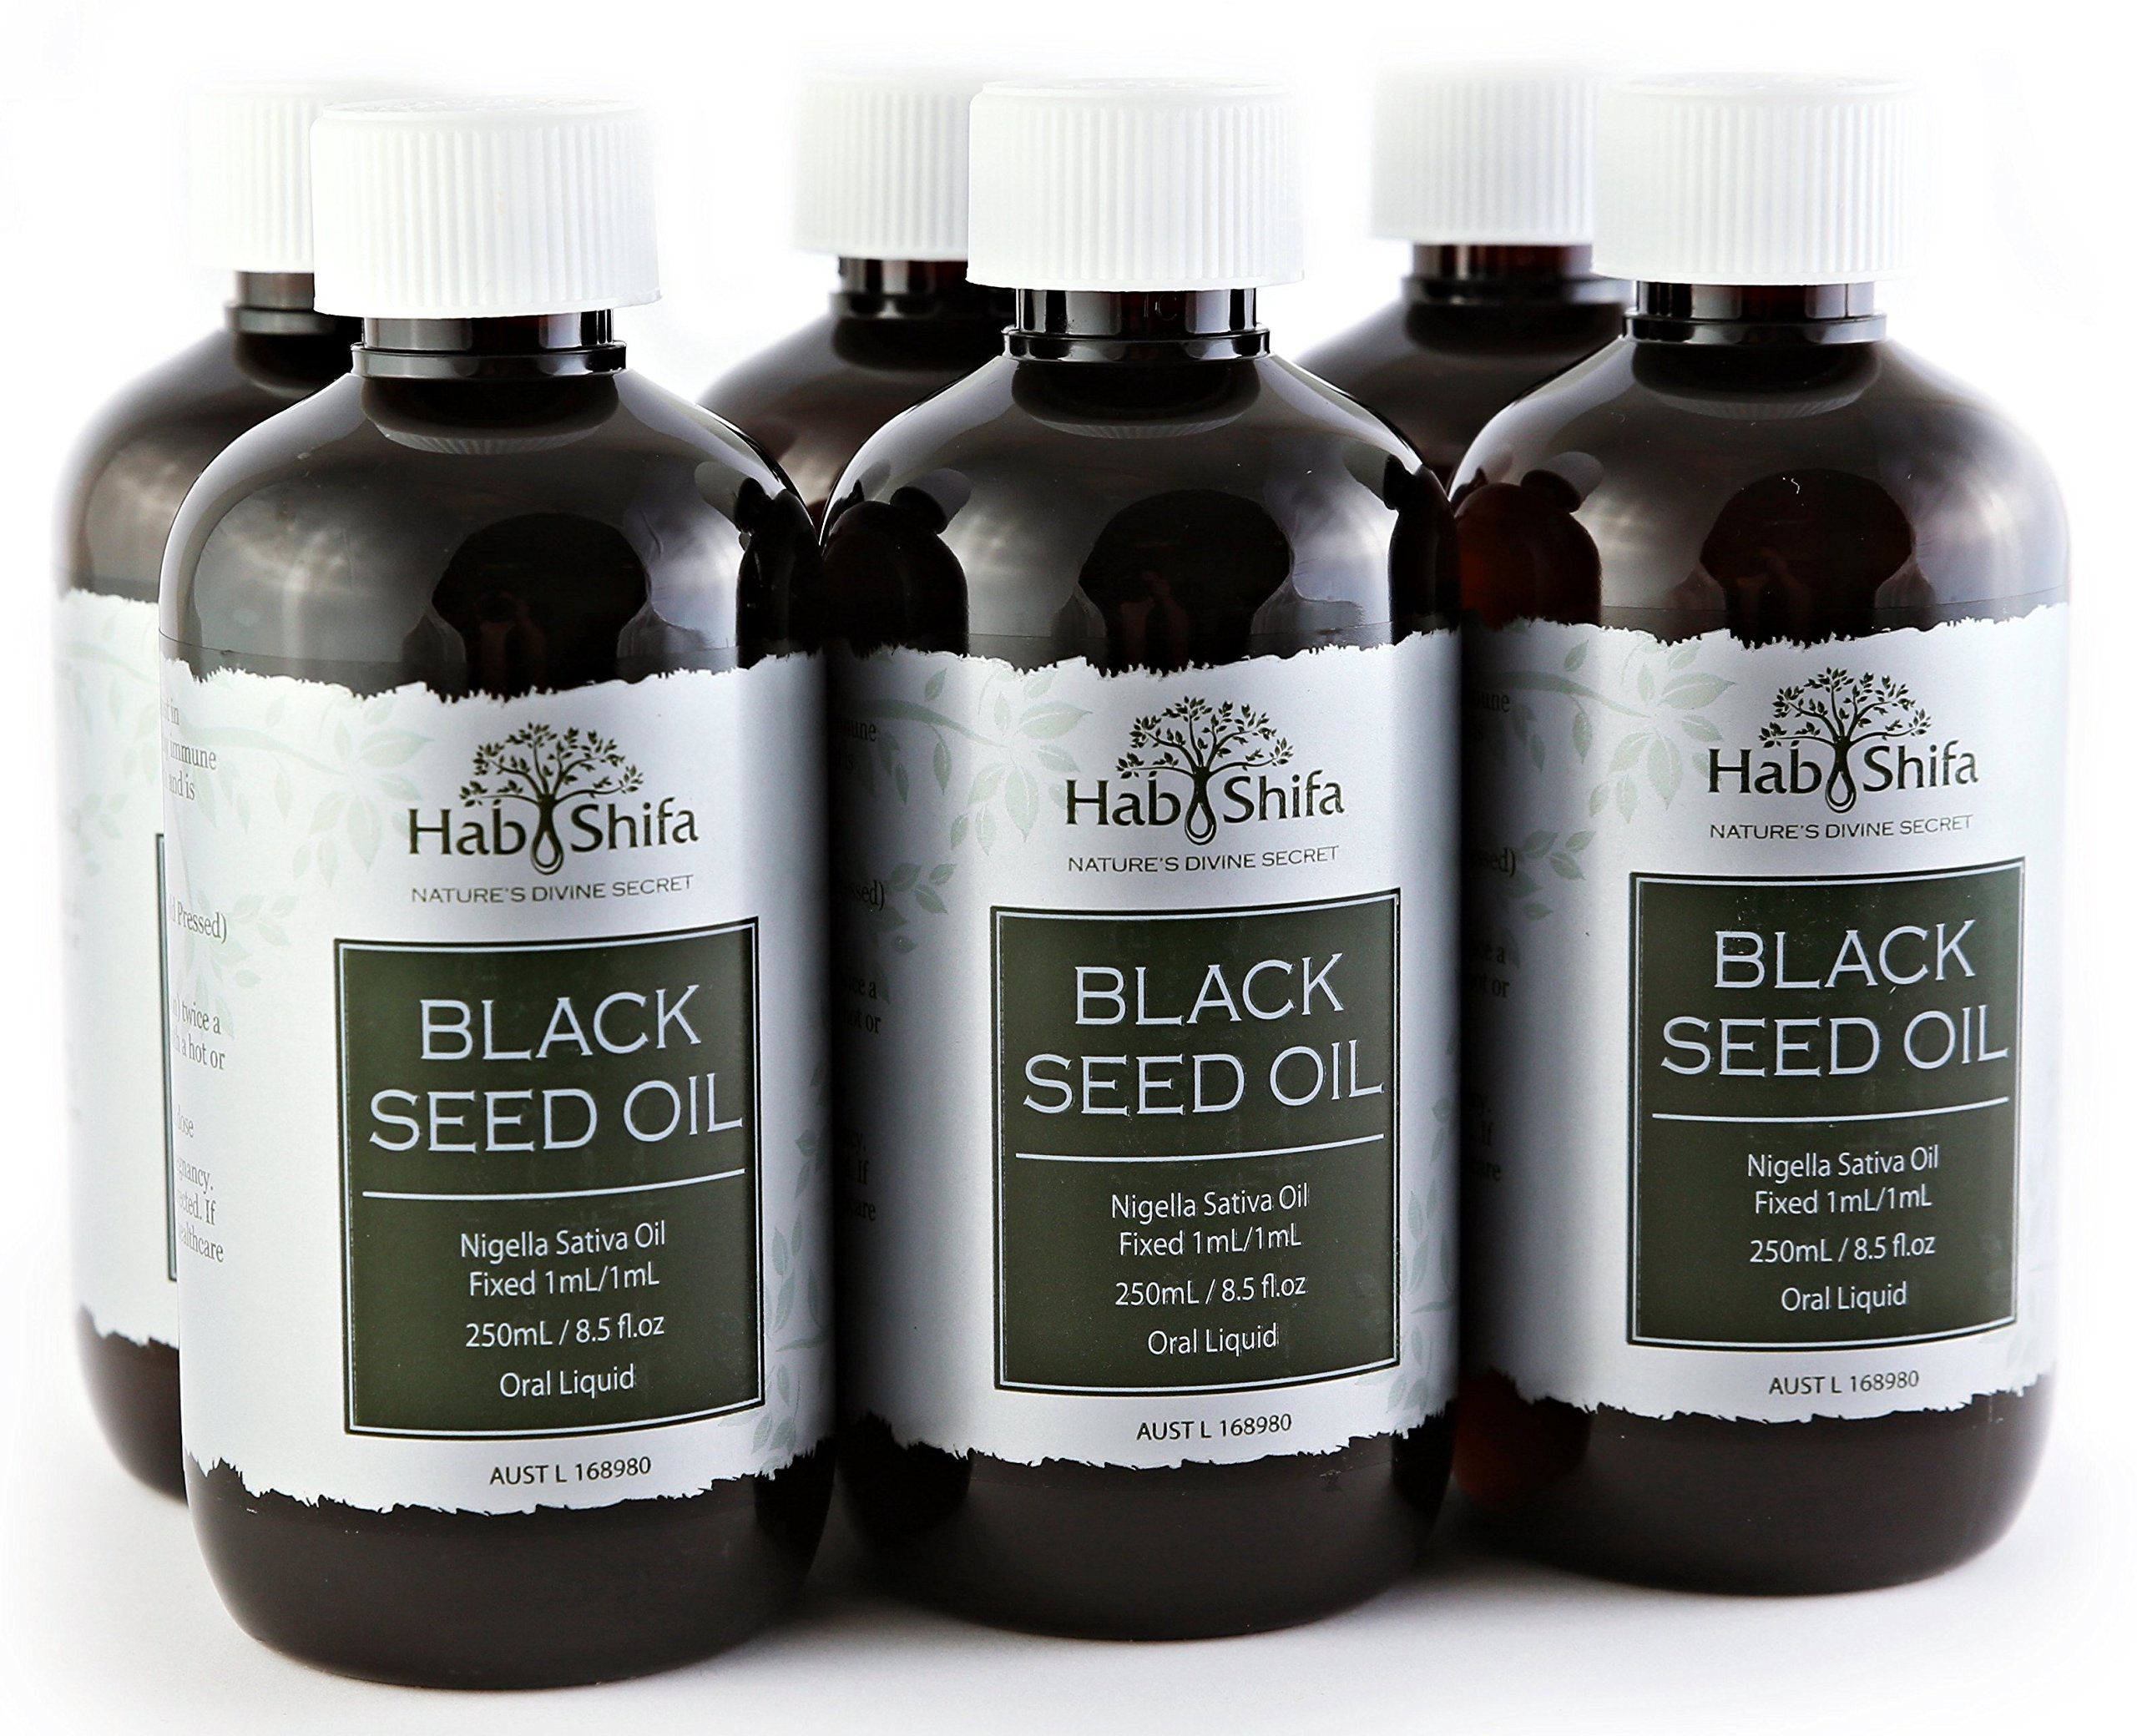 Hab Shifa Black Seed Oil (250ml) 6 Pack Bulk